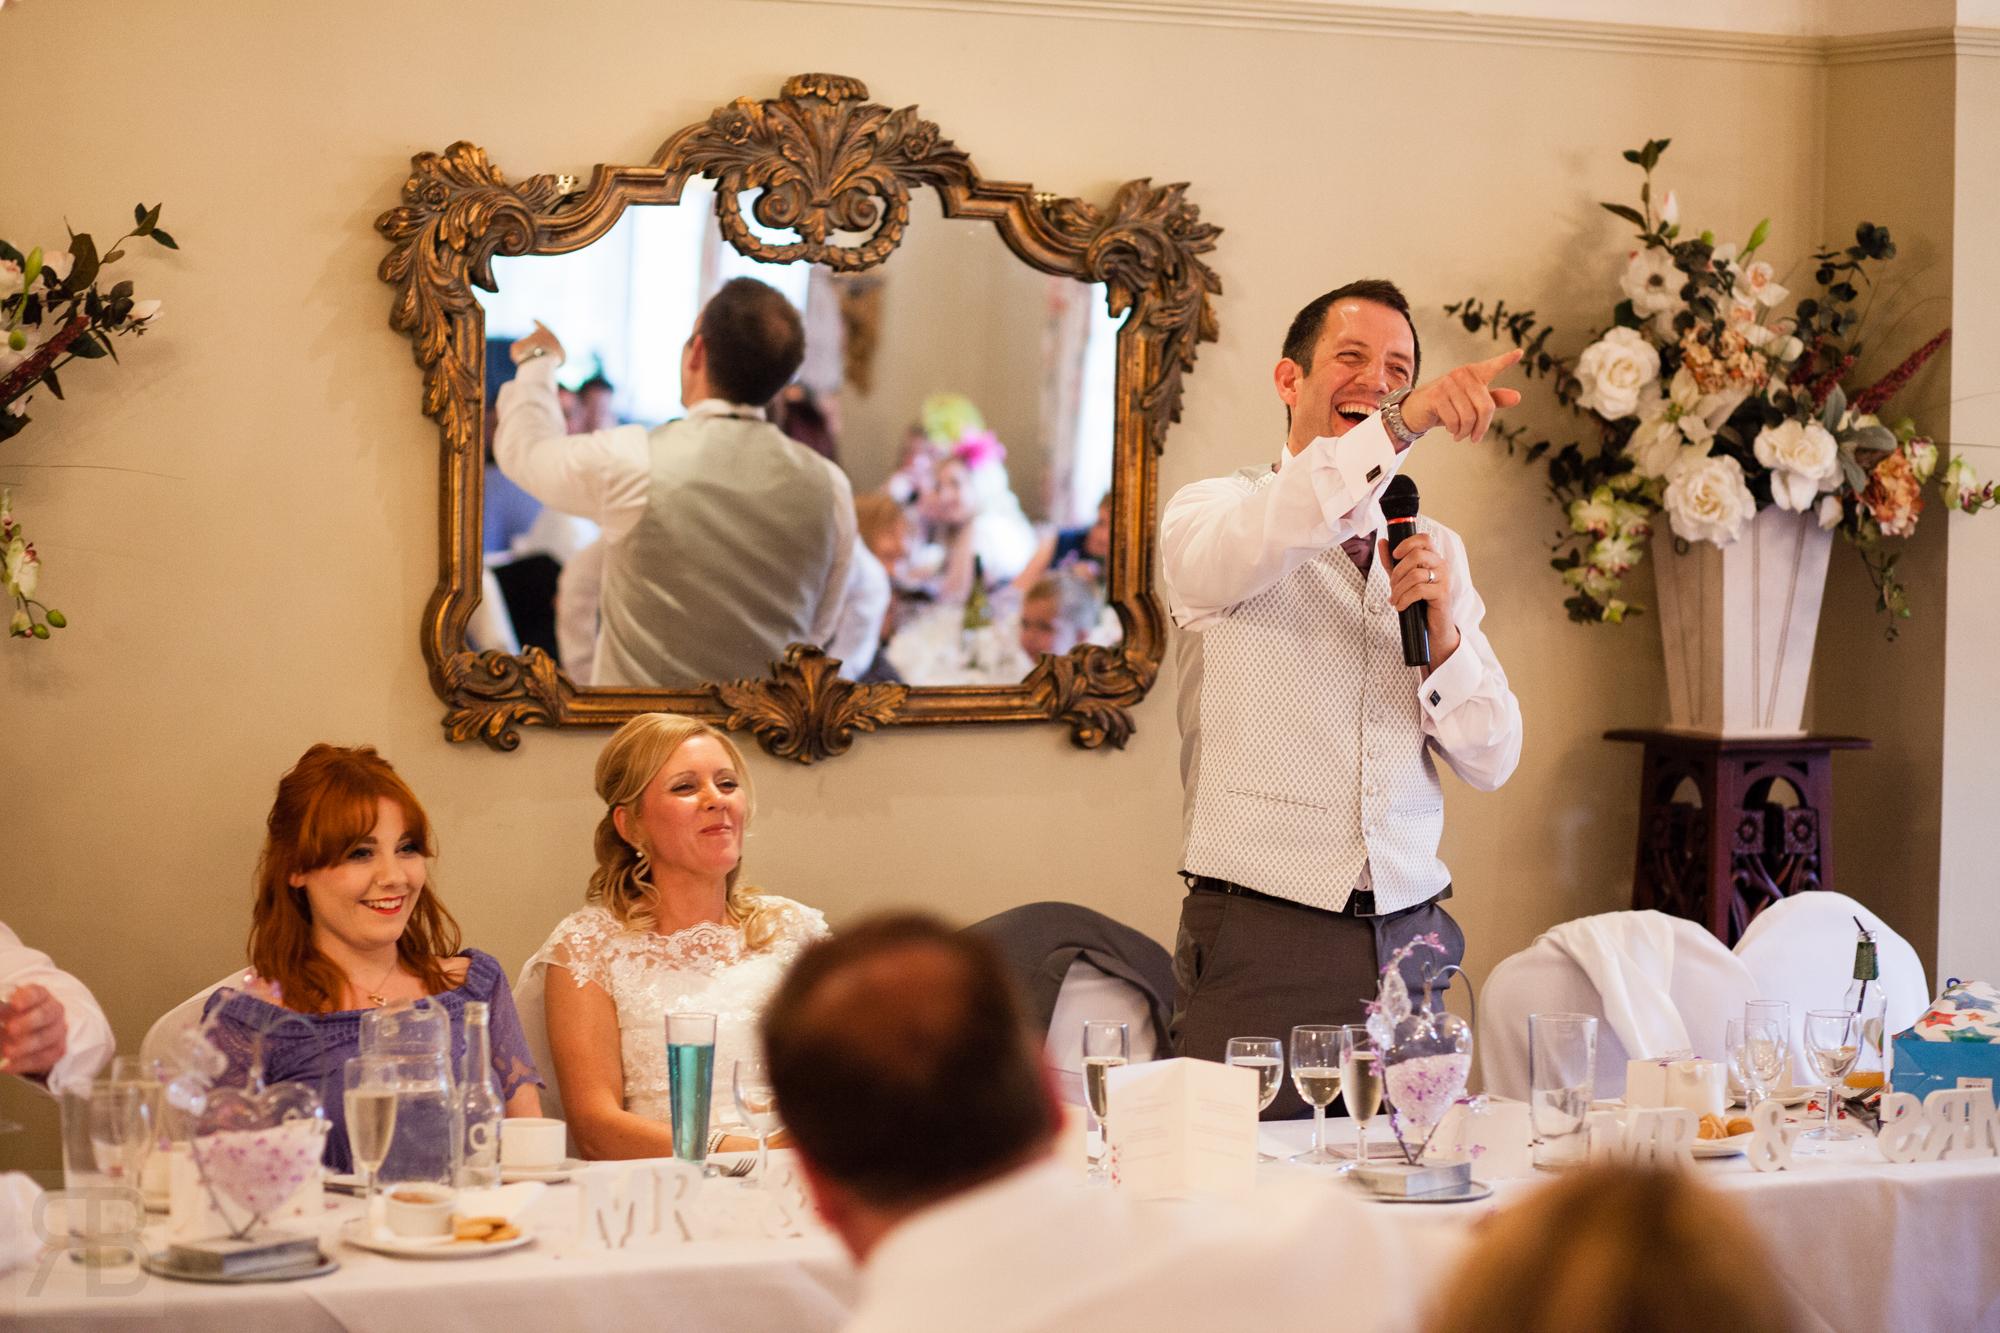 110715_LisaCraigJohnson_Wedding_5991583_WebWM.jpg